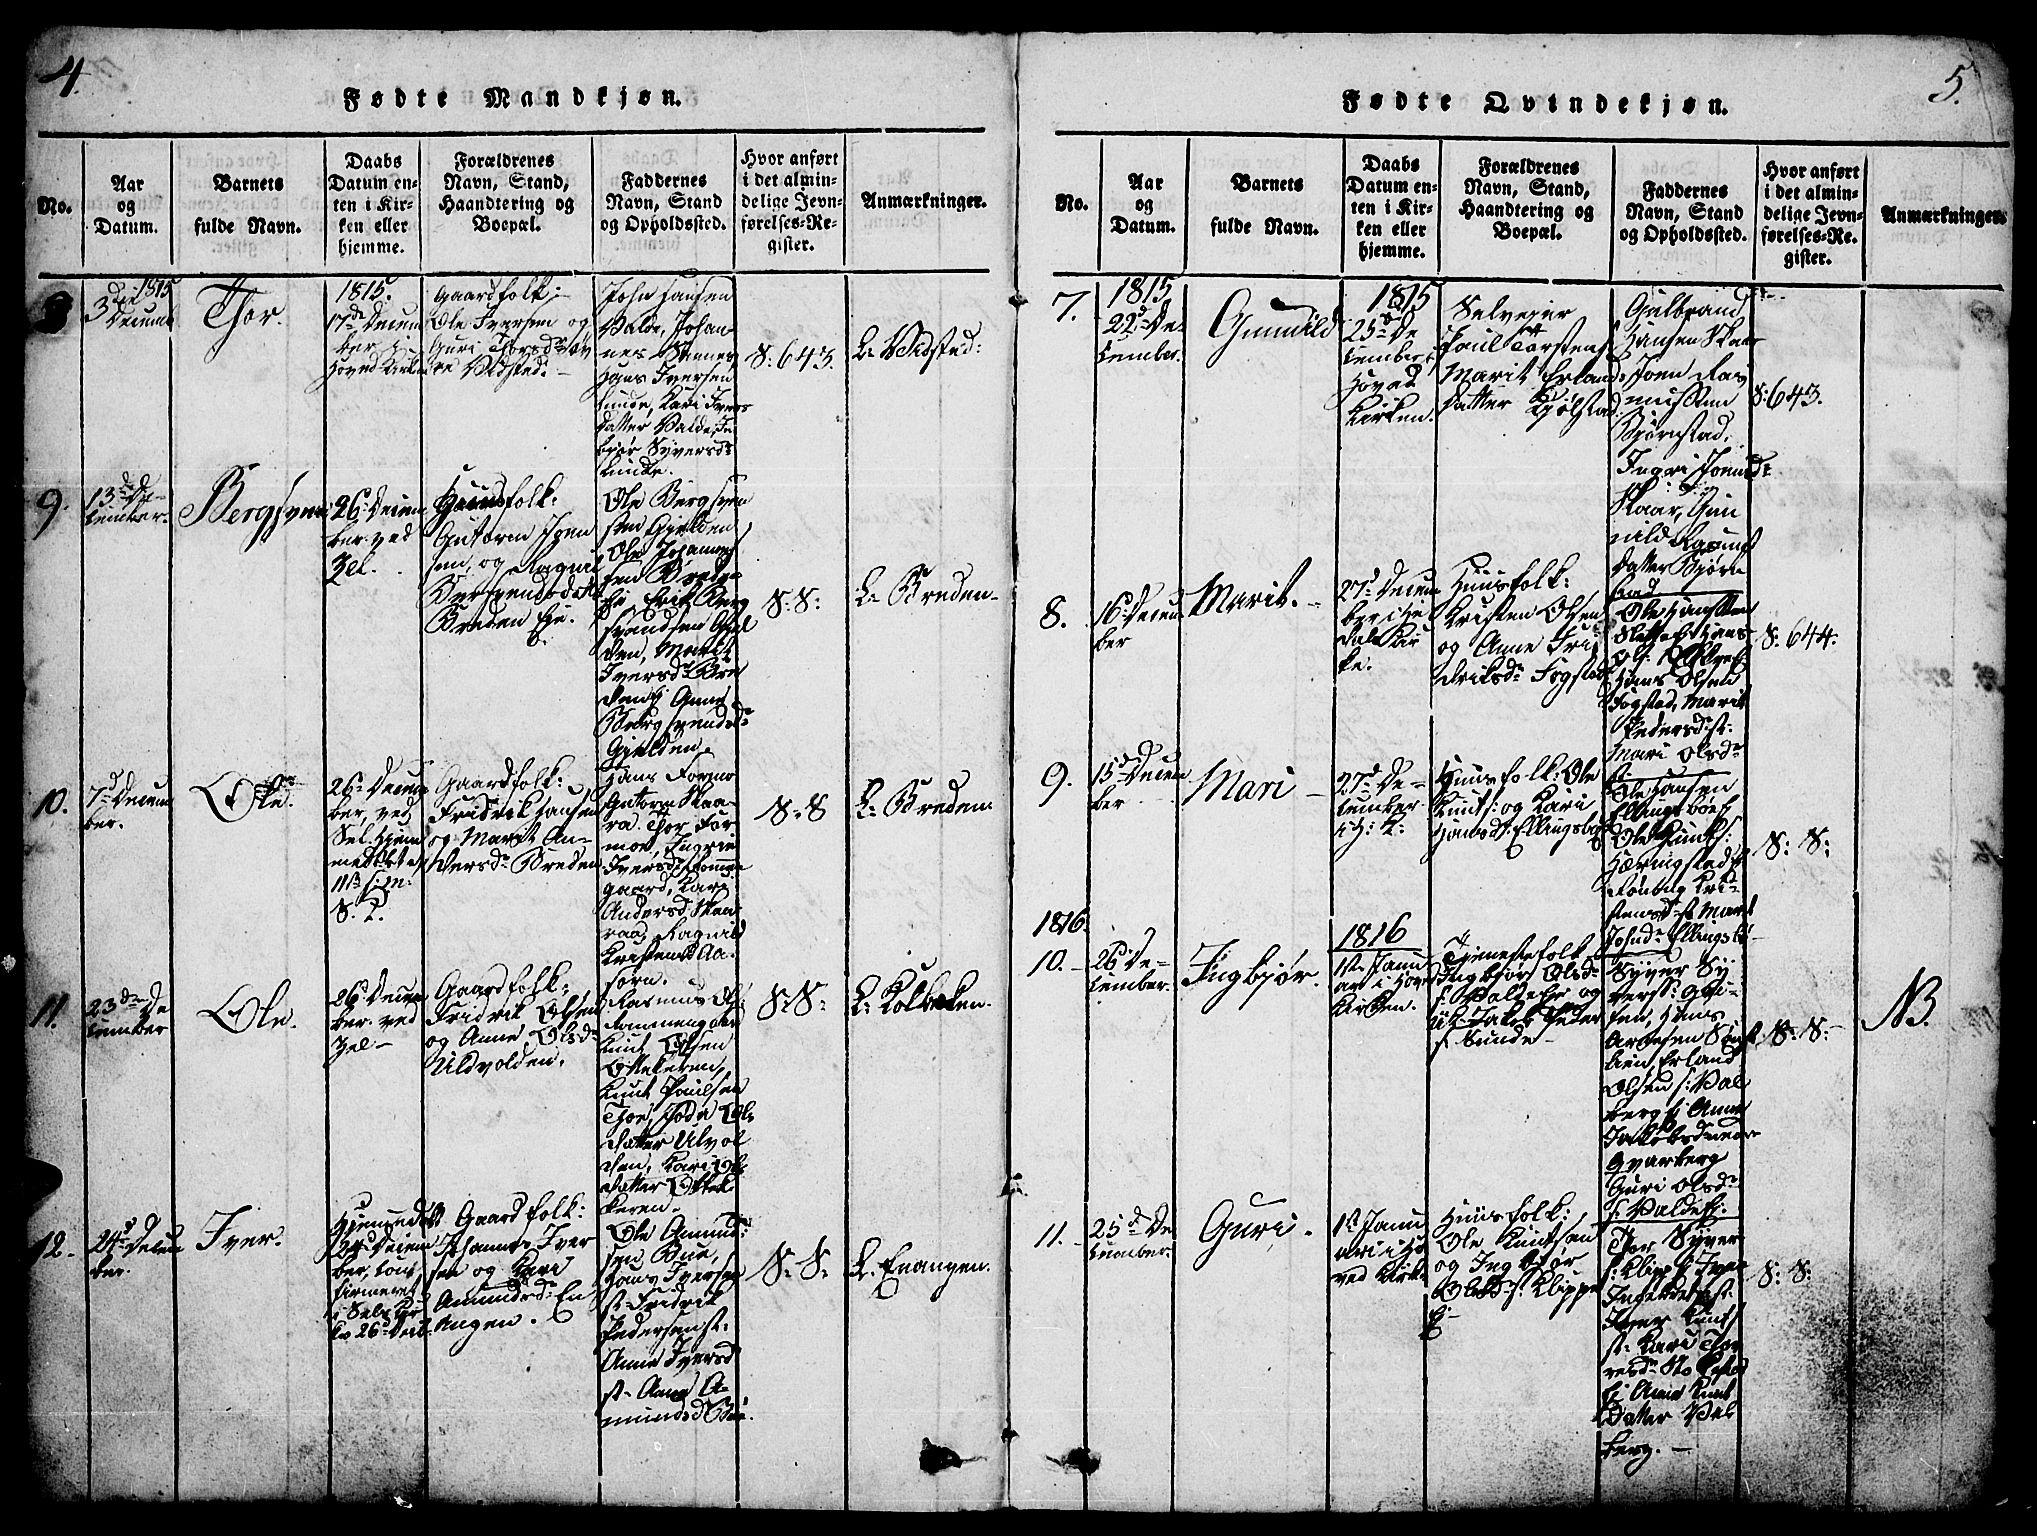 SAH, Vågå prestekontor, Ministerialbok nr. 3, 1815-1827, s. 4-5